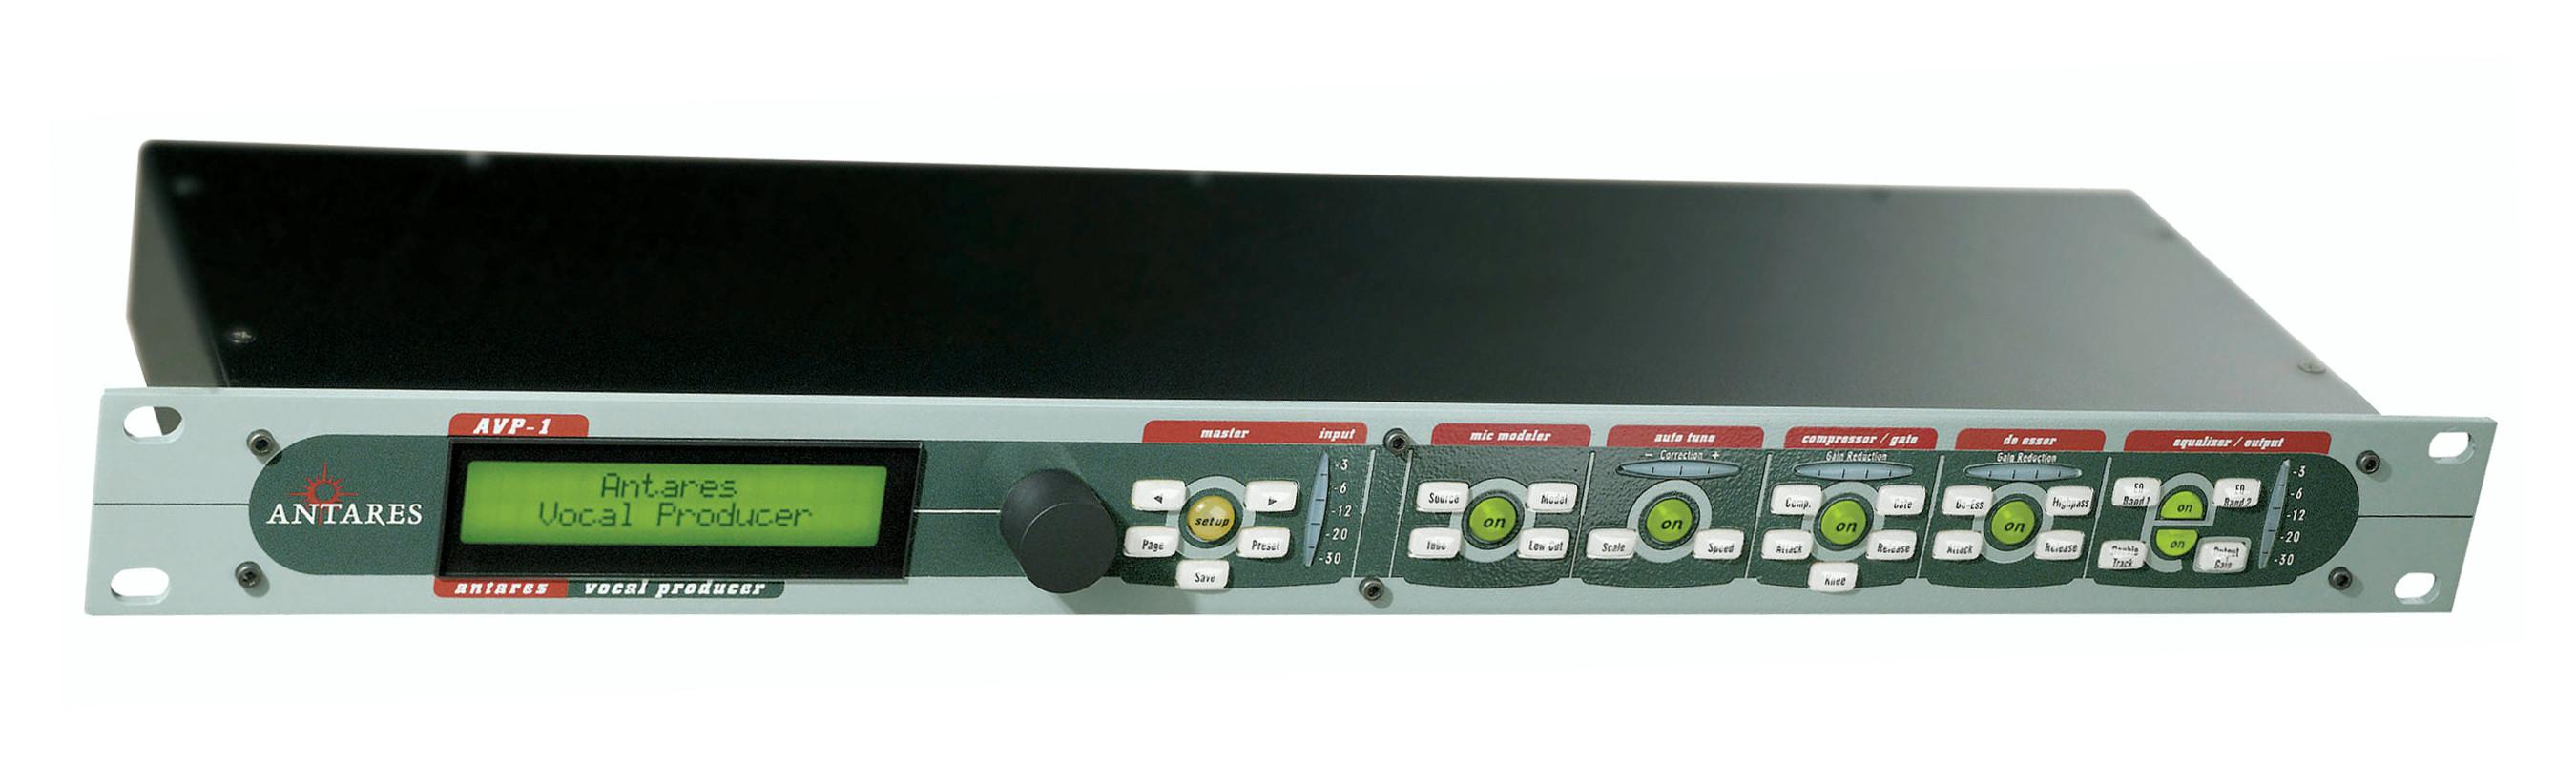 antares avp 1 vocal processor with autotune rentals chicago and